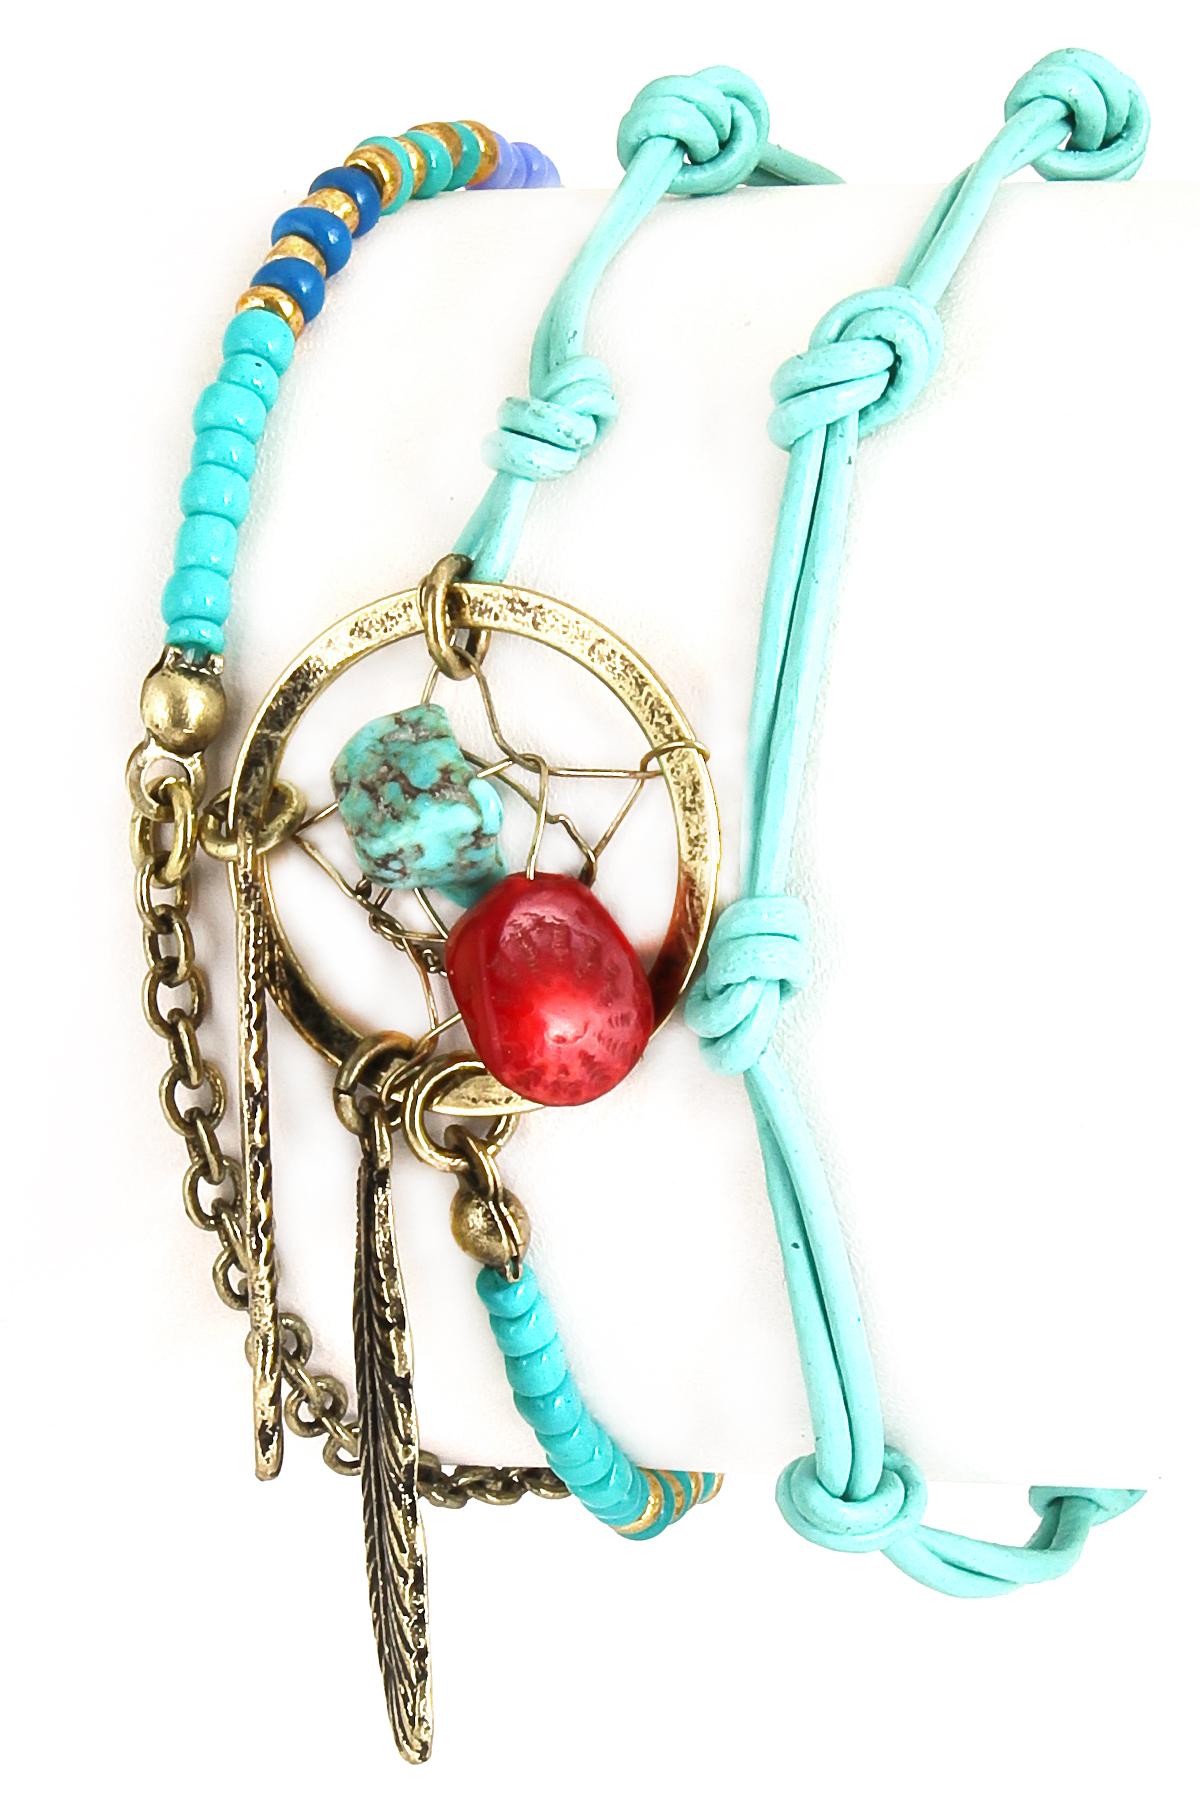 Dream Catcher Seed Bead Wrap Bracelet - Bracelets